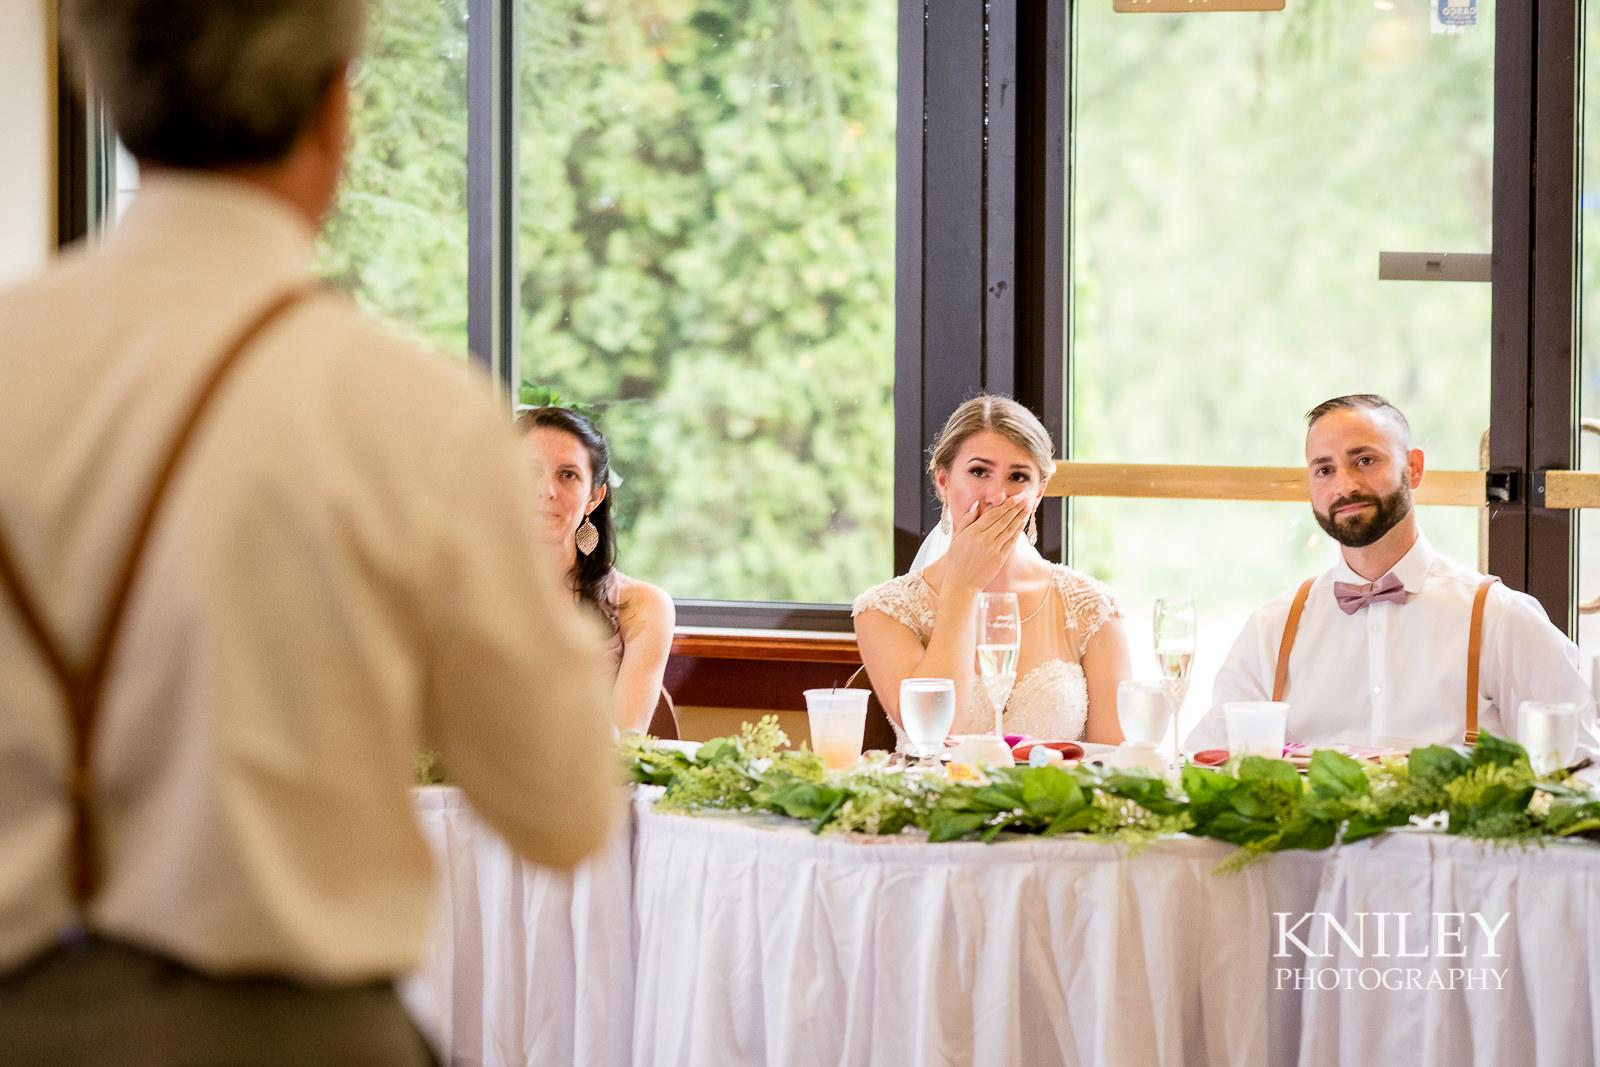 086 - Ontario Golf Club Wedding Pictures - XT2B8971.jpg